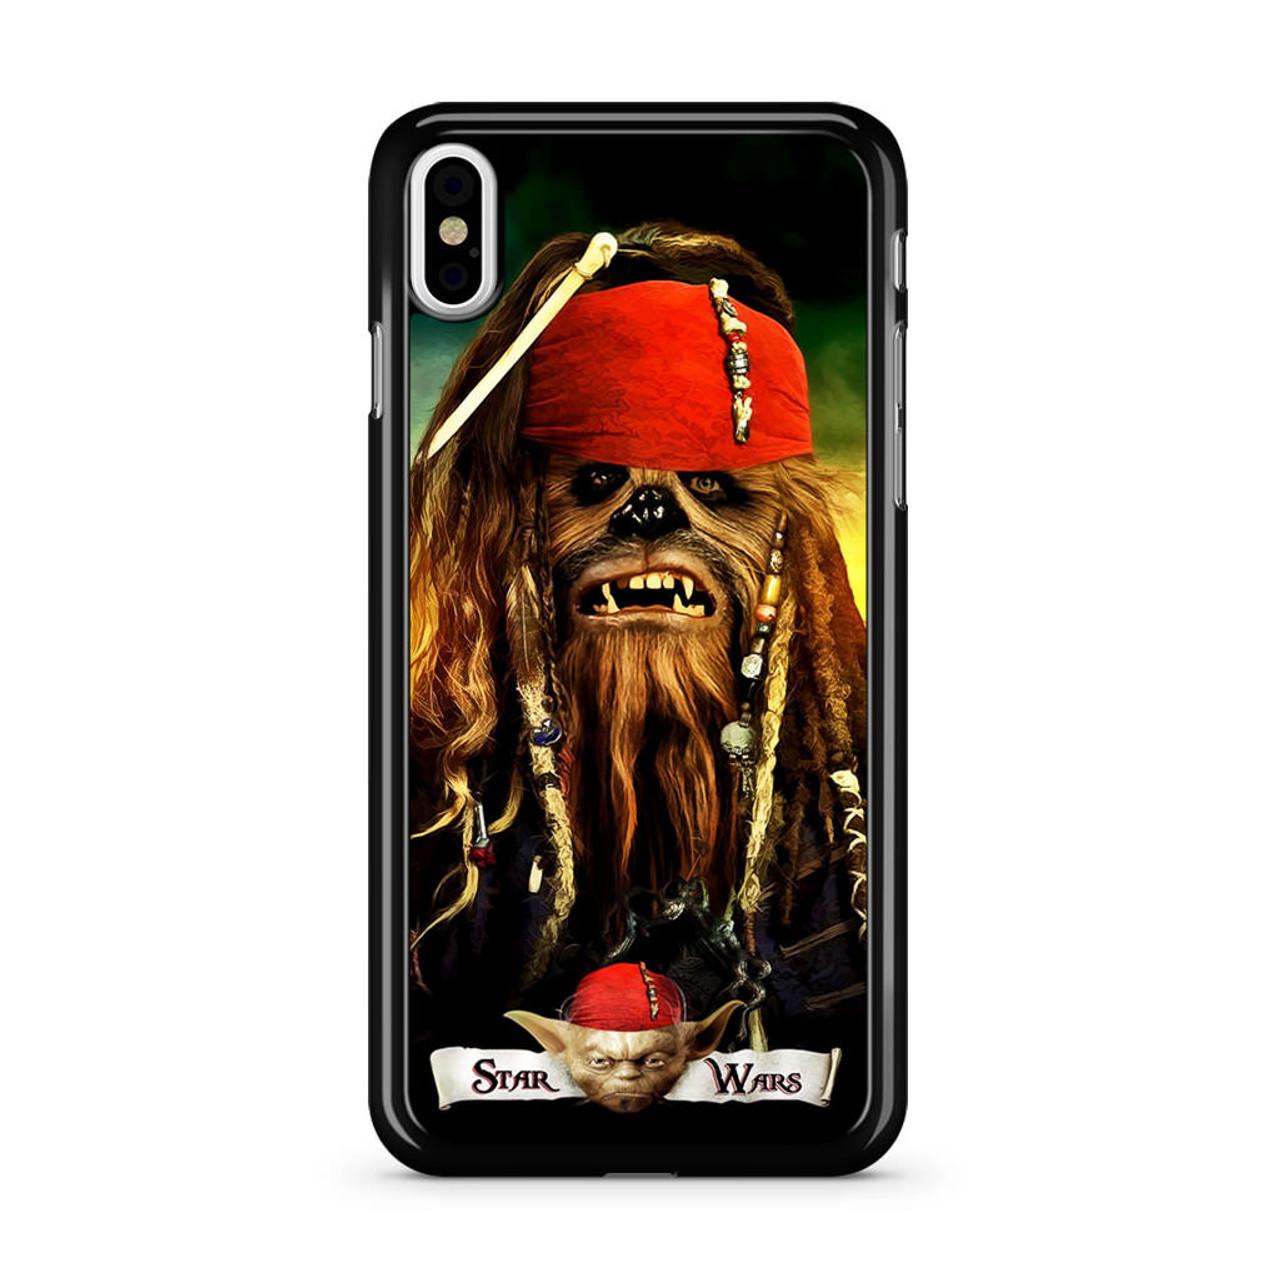 brand new 2bf12 f4584 Captain Chewbacca Pirate iPhone X Case